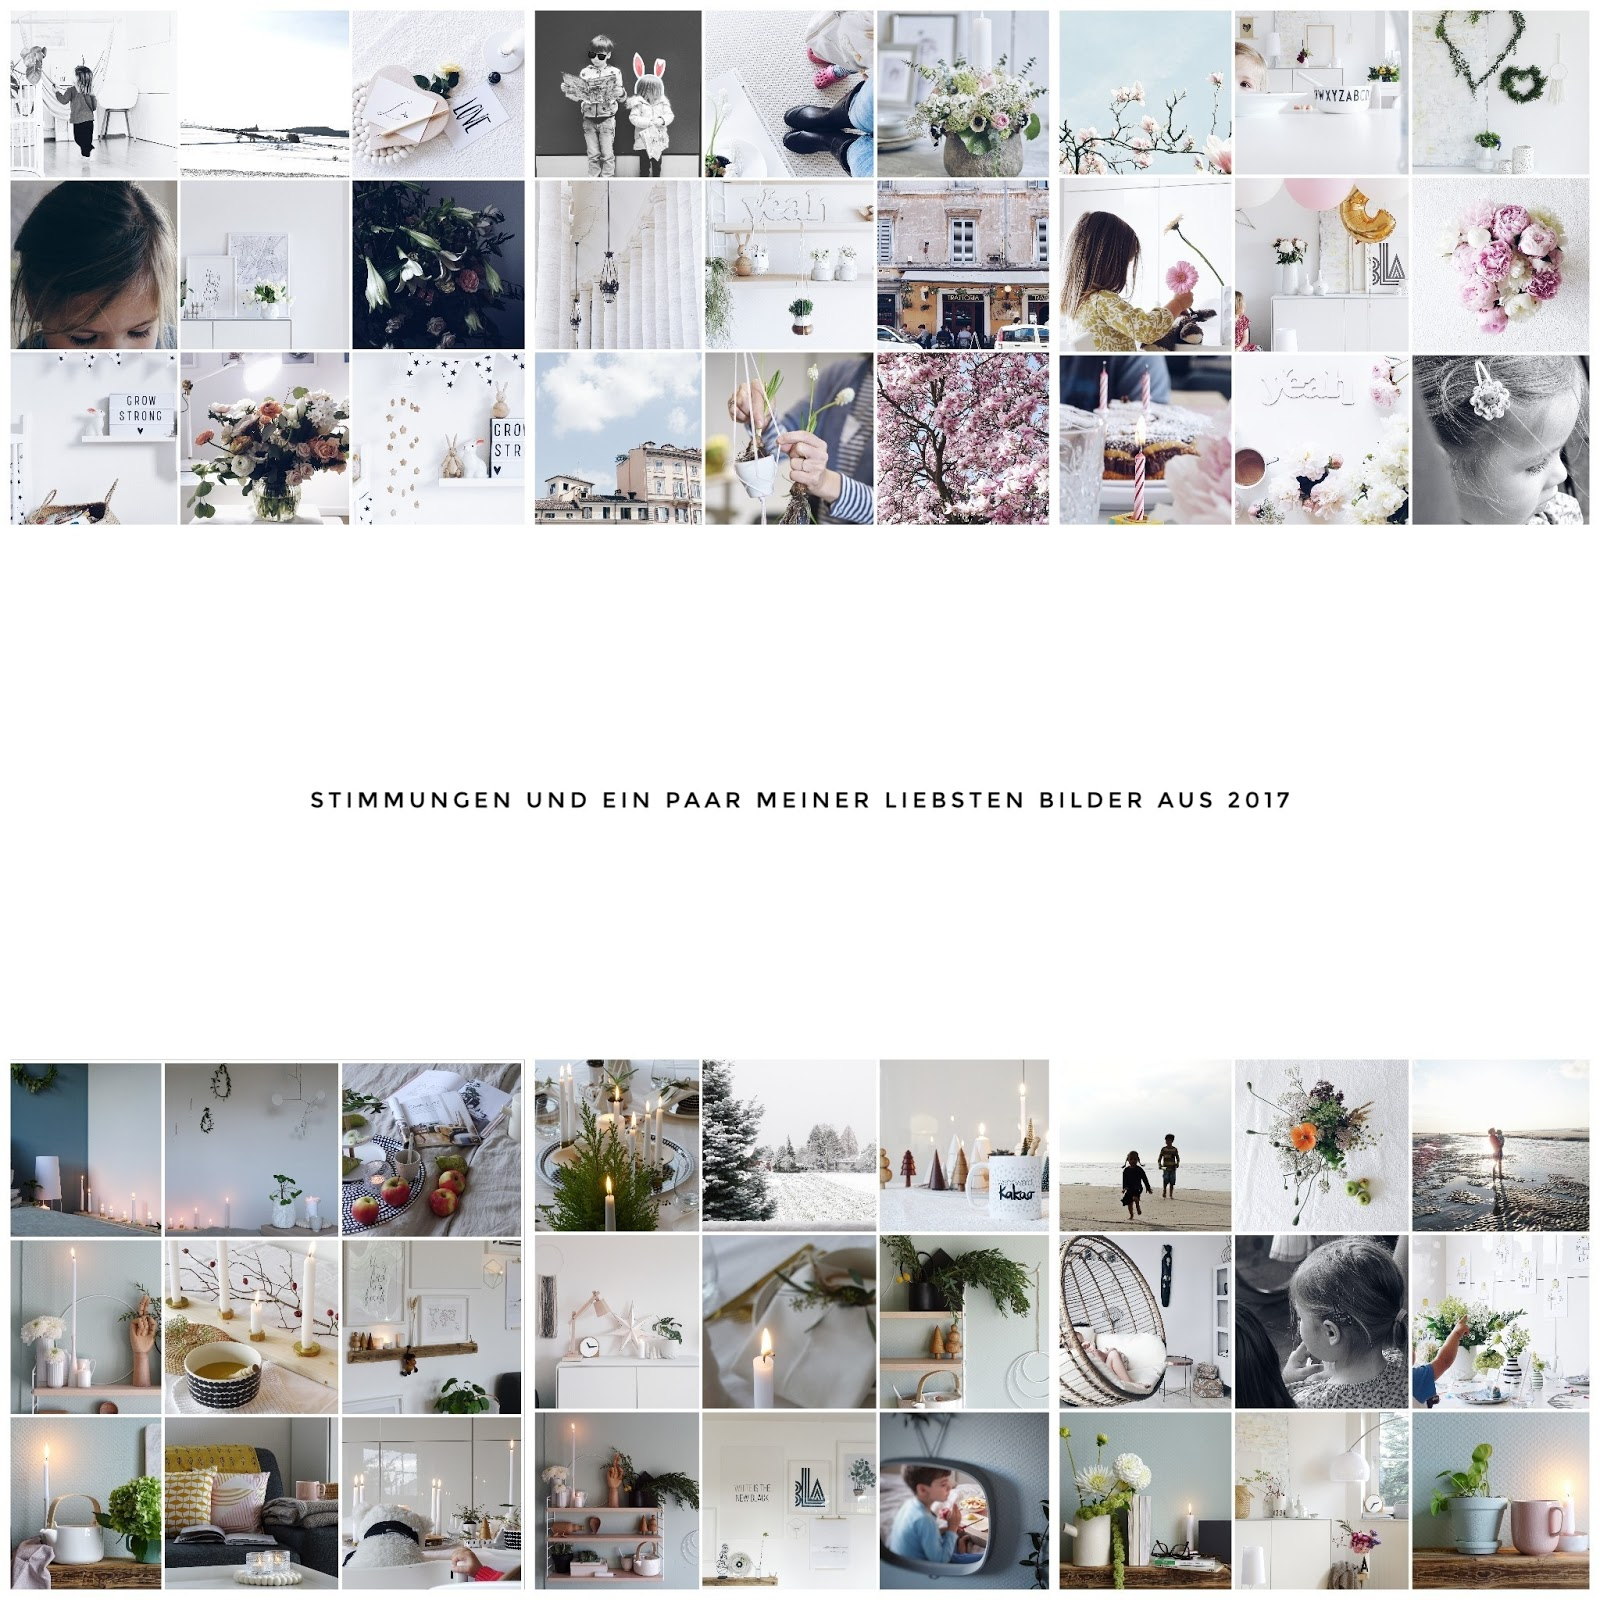 Mein Rückblick auf 2017 - Hallo 2018, Tschüß 2017 - https://mammilade.blogspot.de